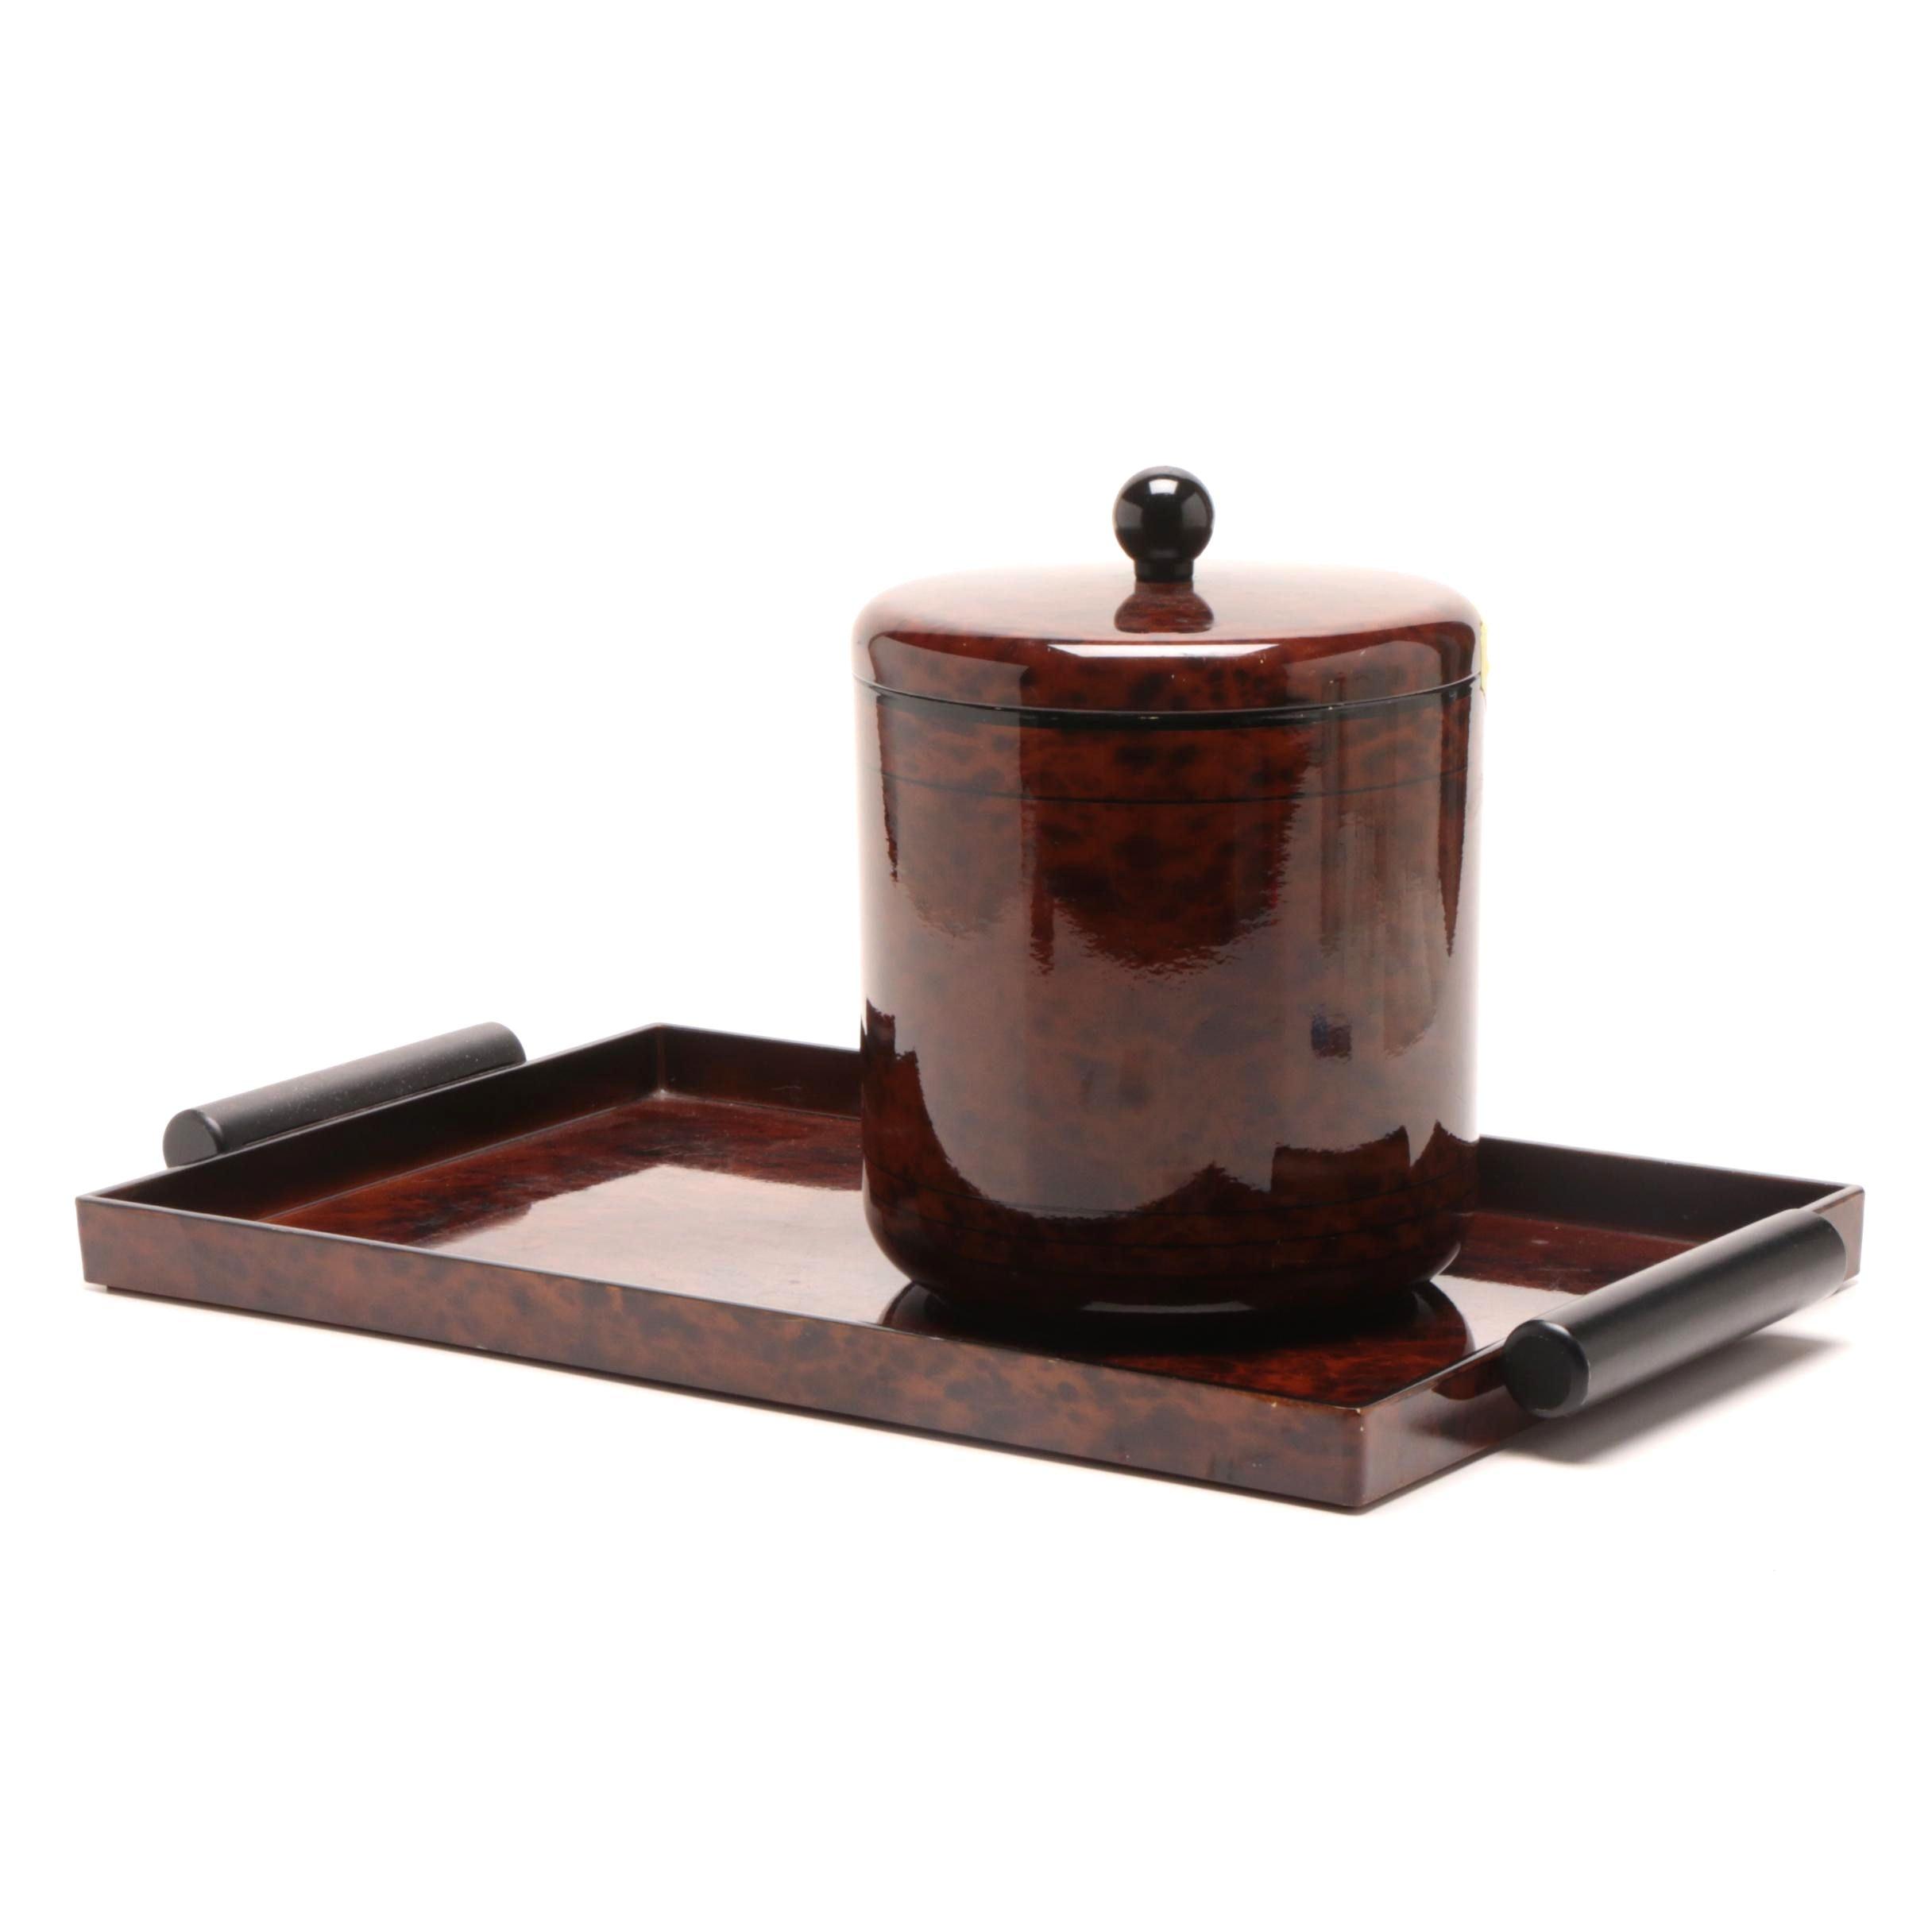 Nancy Calhoun Lacquerware Serving Tray and Ice Bucket